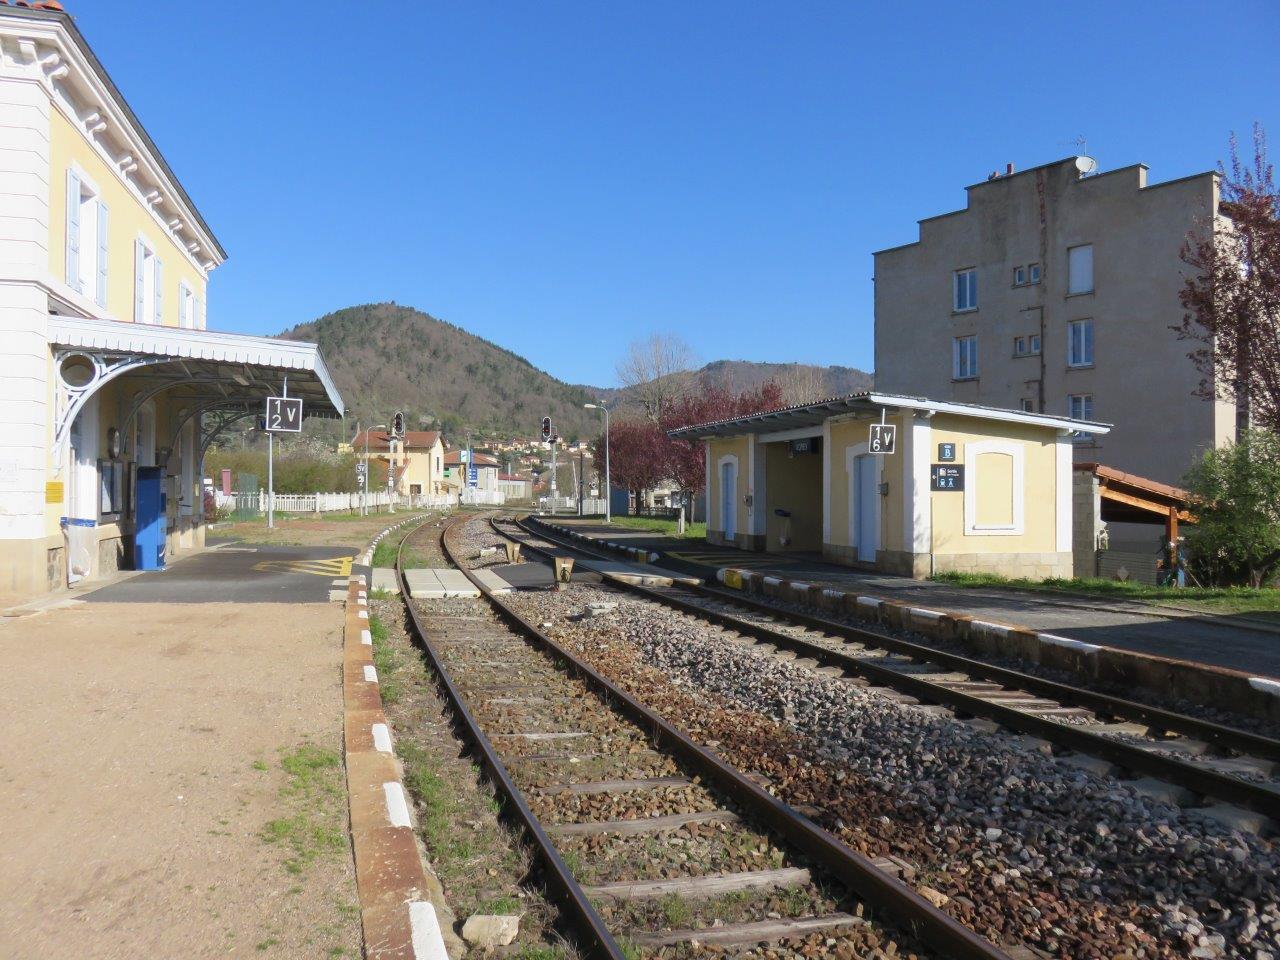 gare-de-vorey-train-station